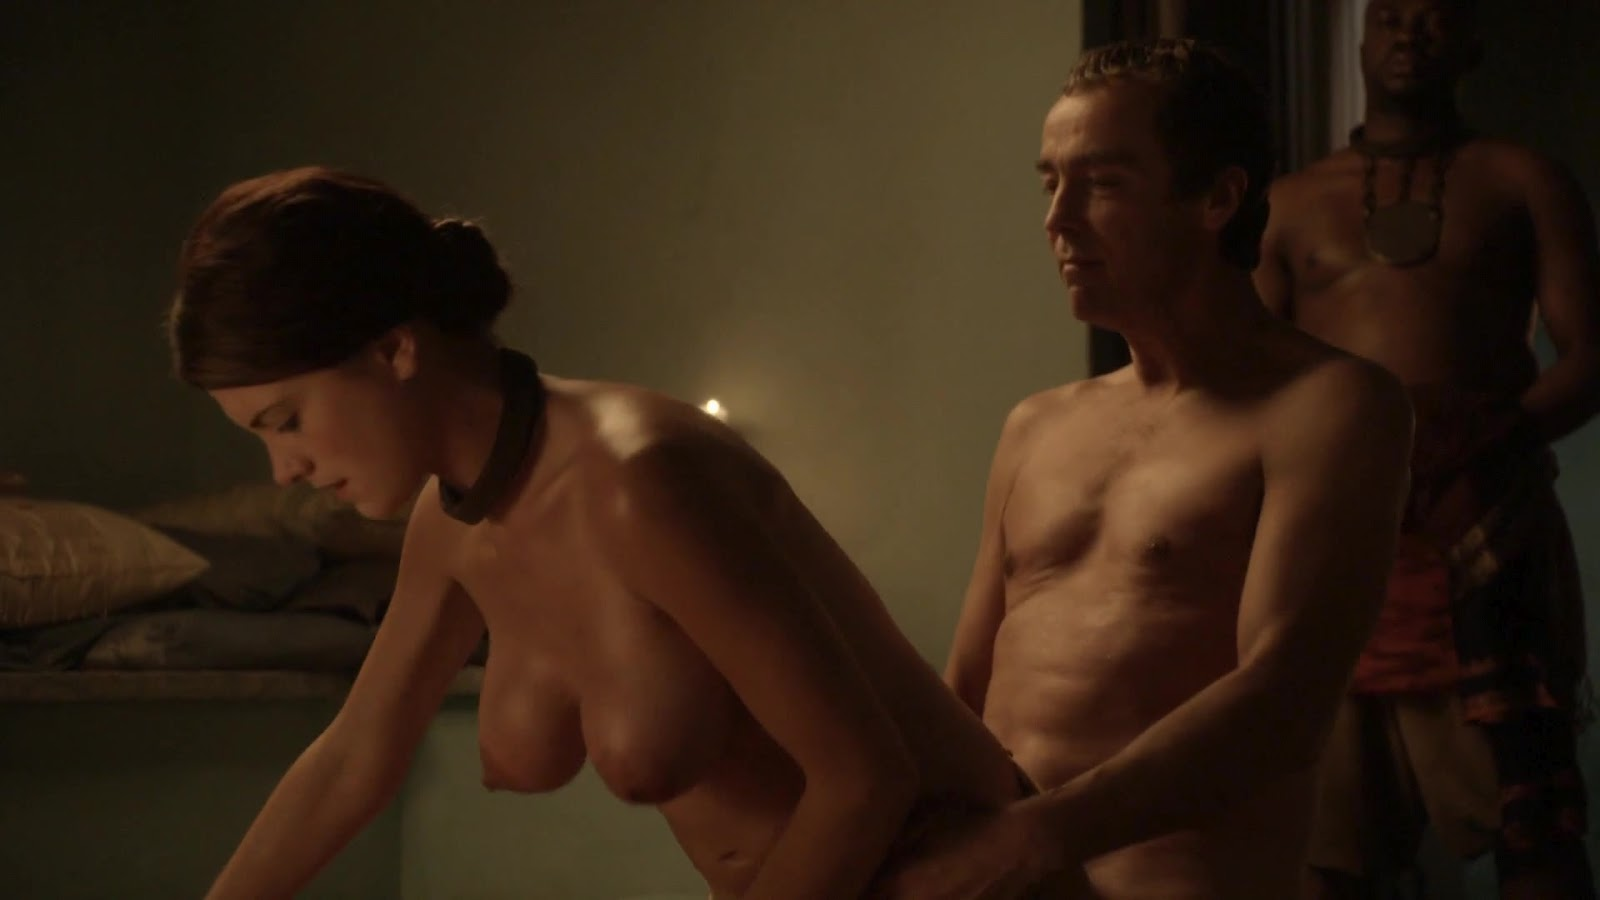 300-eroticheskih-stsen